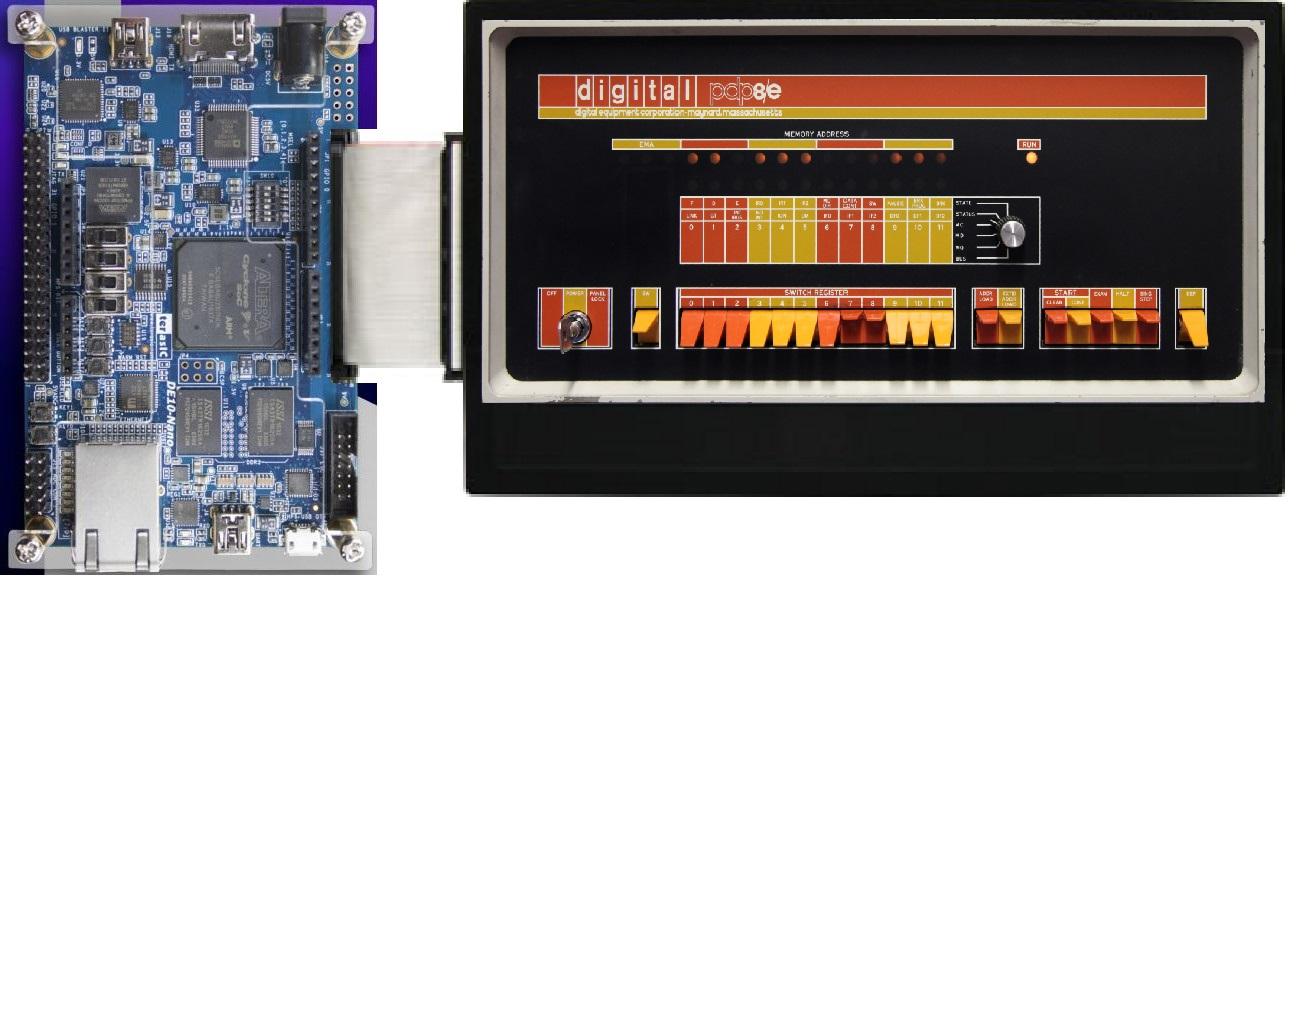 InnovateFPGA | APJ | AP035 - PDP-8/e compatible minicomputer with ...